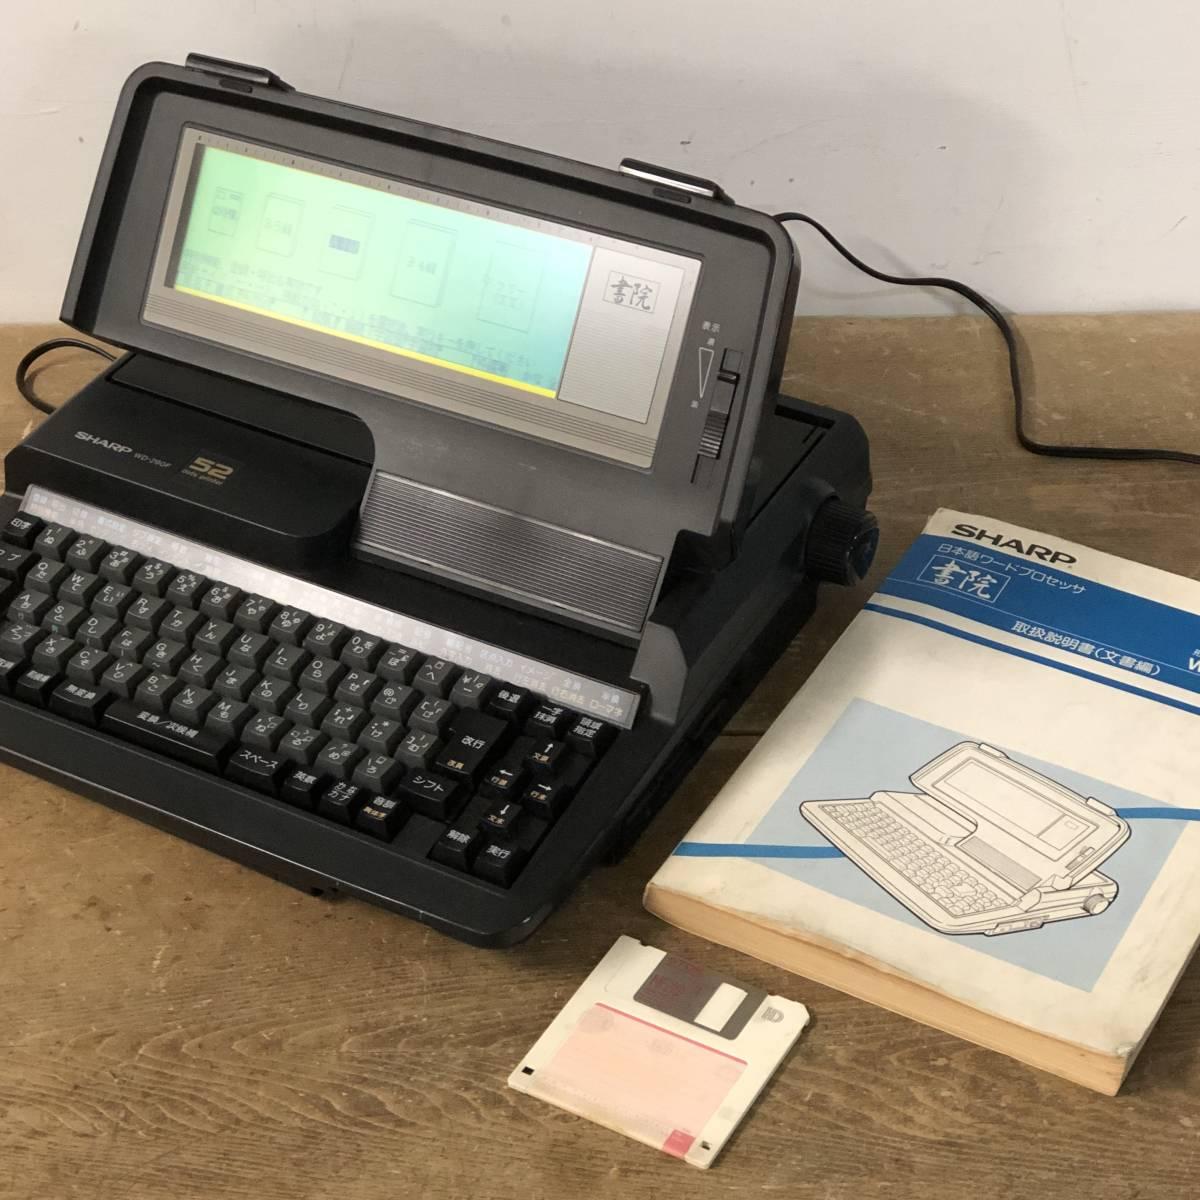 SHARP シャープ 日本語ワードプロセッサ 書院 WD-290W ワープロ 52ドットプリンター 取扱説明書 システムフロッピー 通電確認済 &_画像1